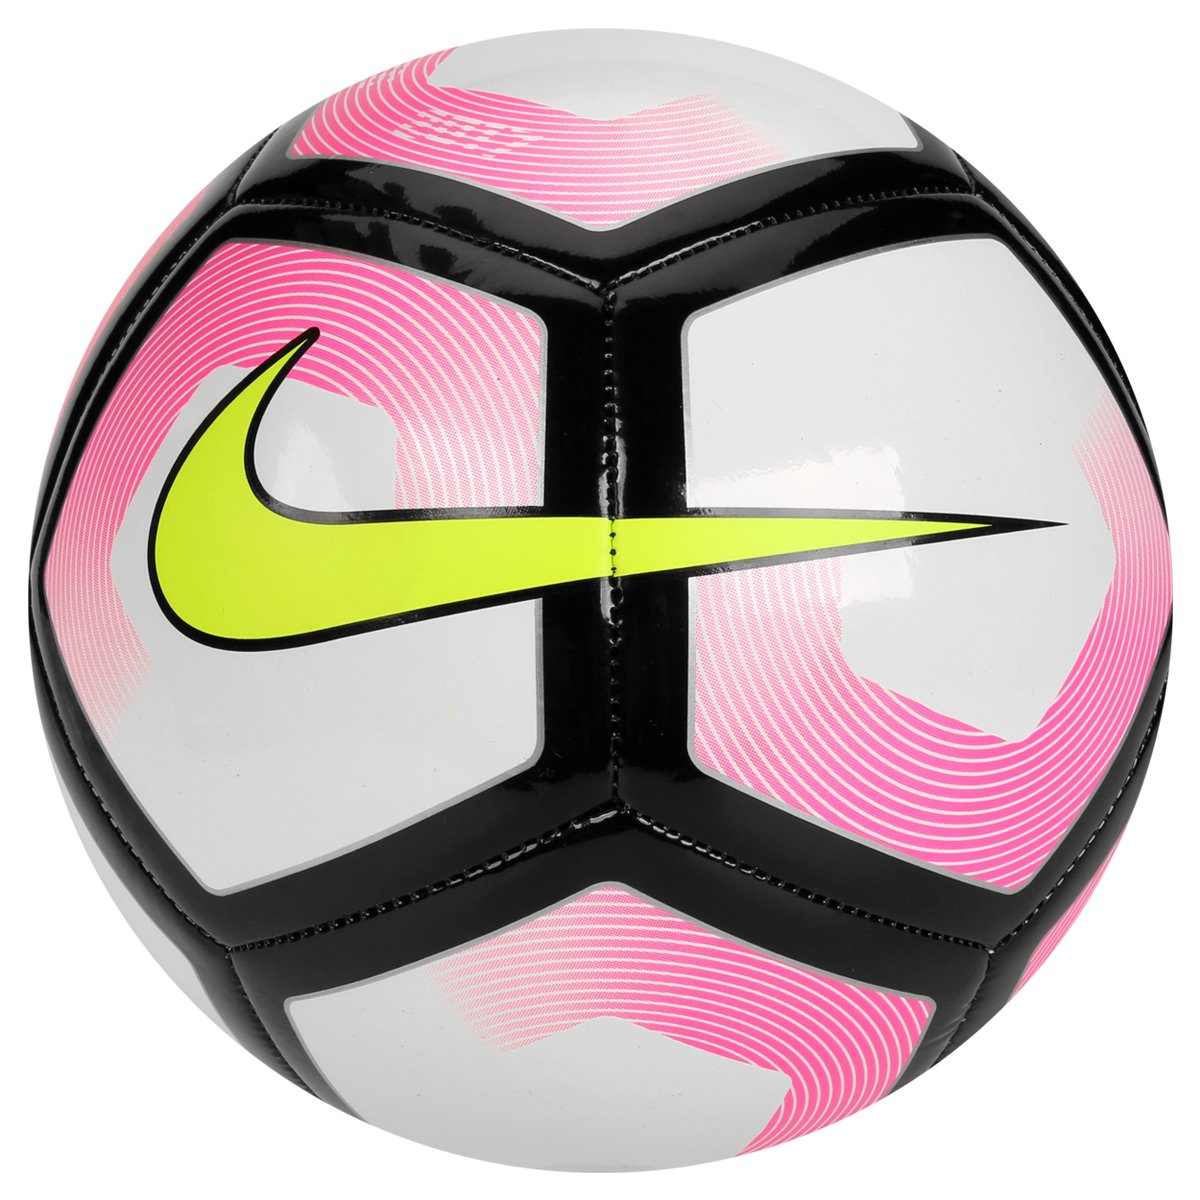 Bola Futebol Nike Pitch Campo - Compre Agora  543208eb64ee7